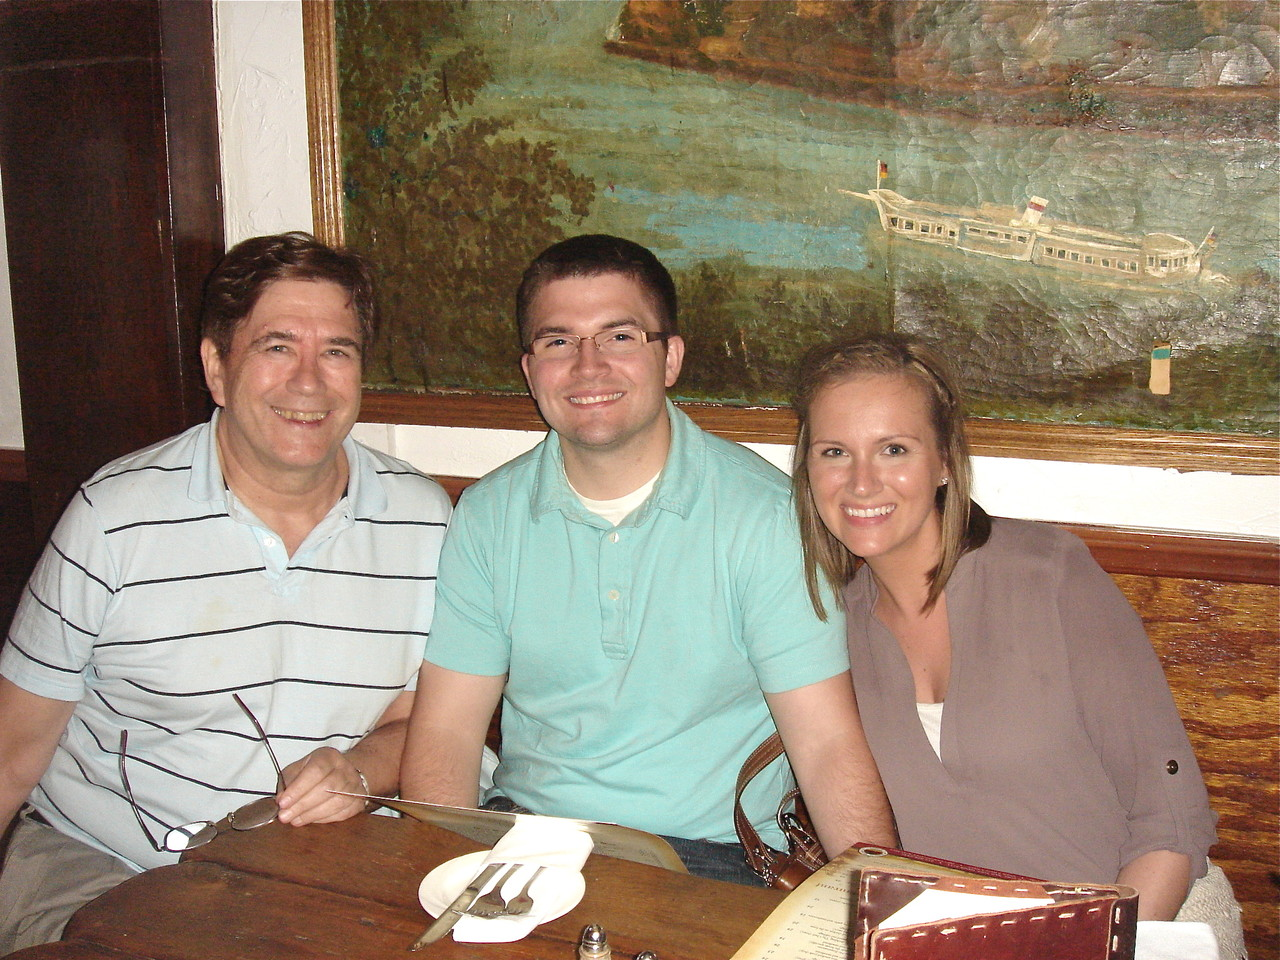 John, Jonathan & Katie at the Heidelberg Restaurant 6-20-2013